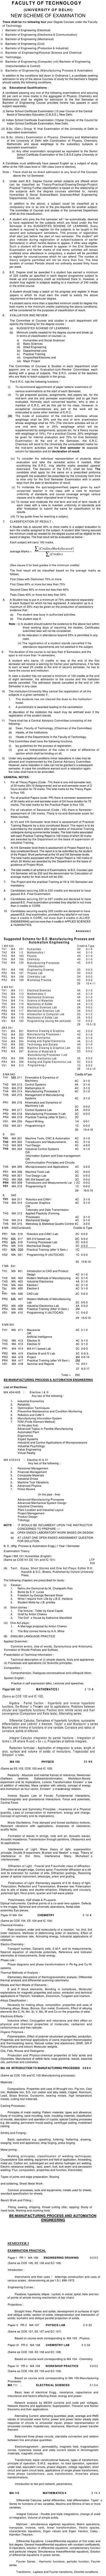 NSIT: Syllabus -Manufacturing Production & Automation Engineering